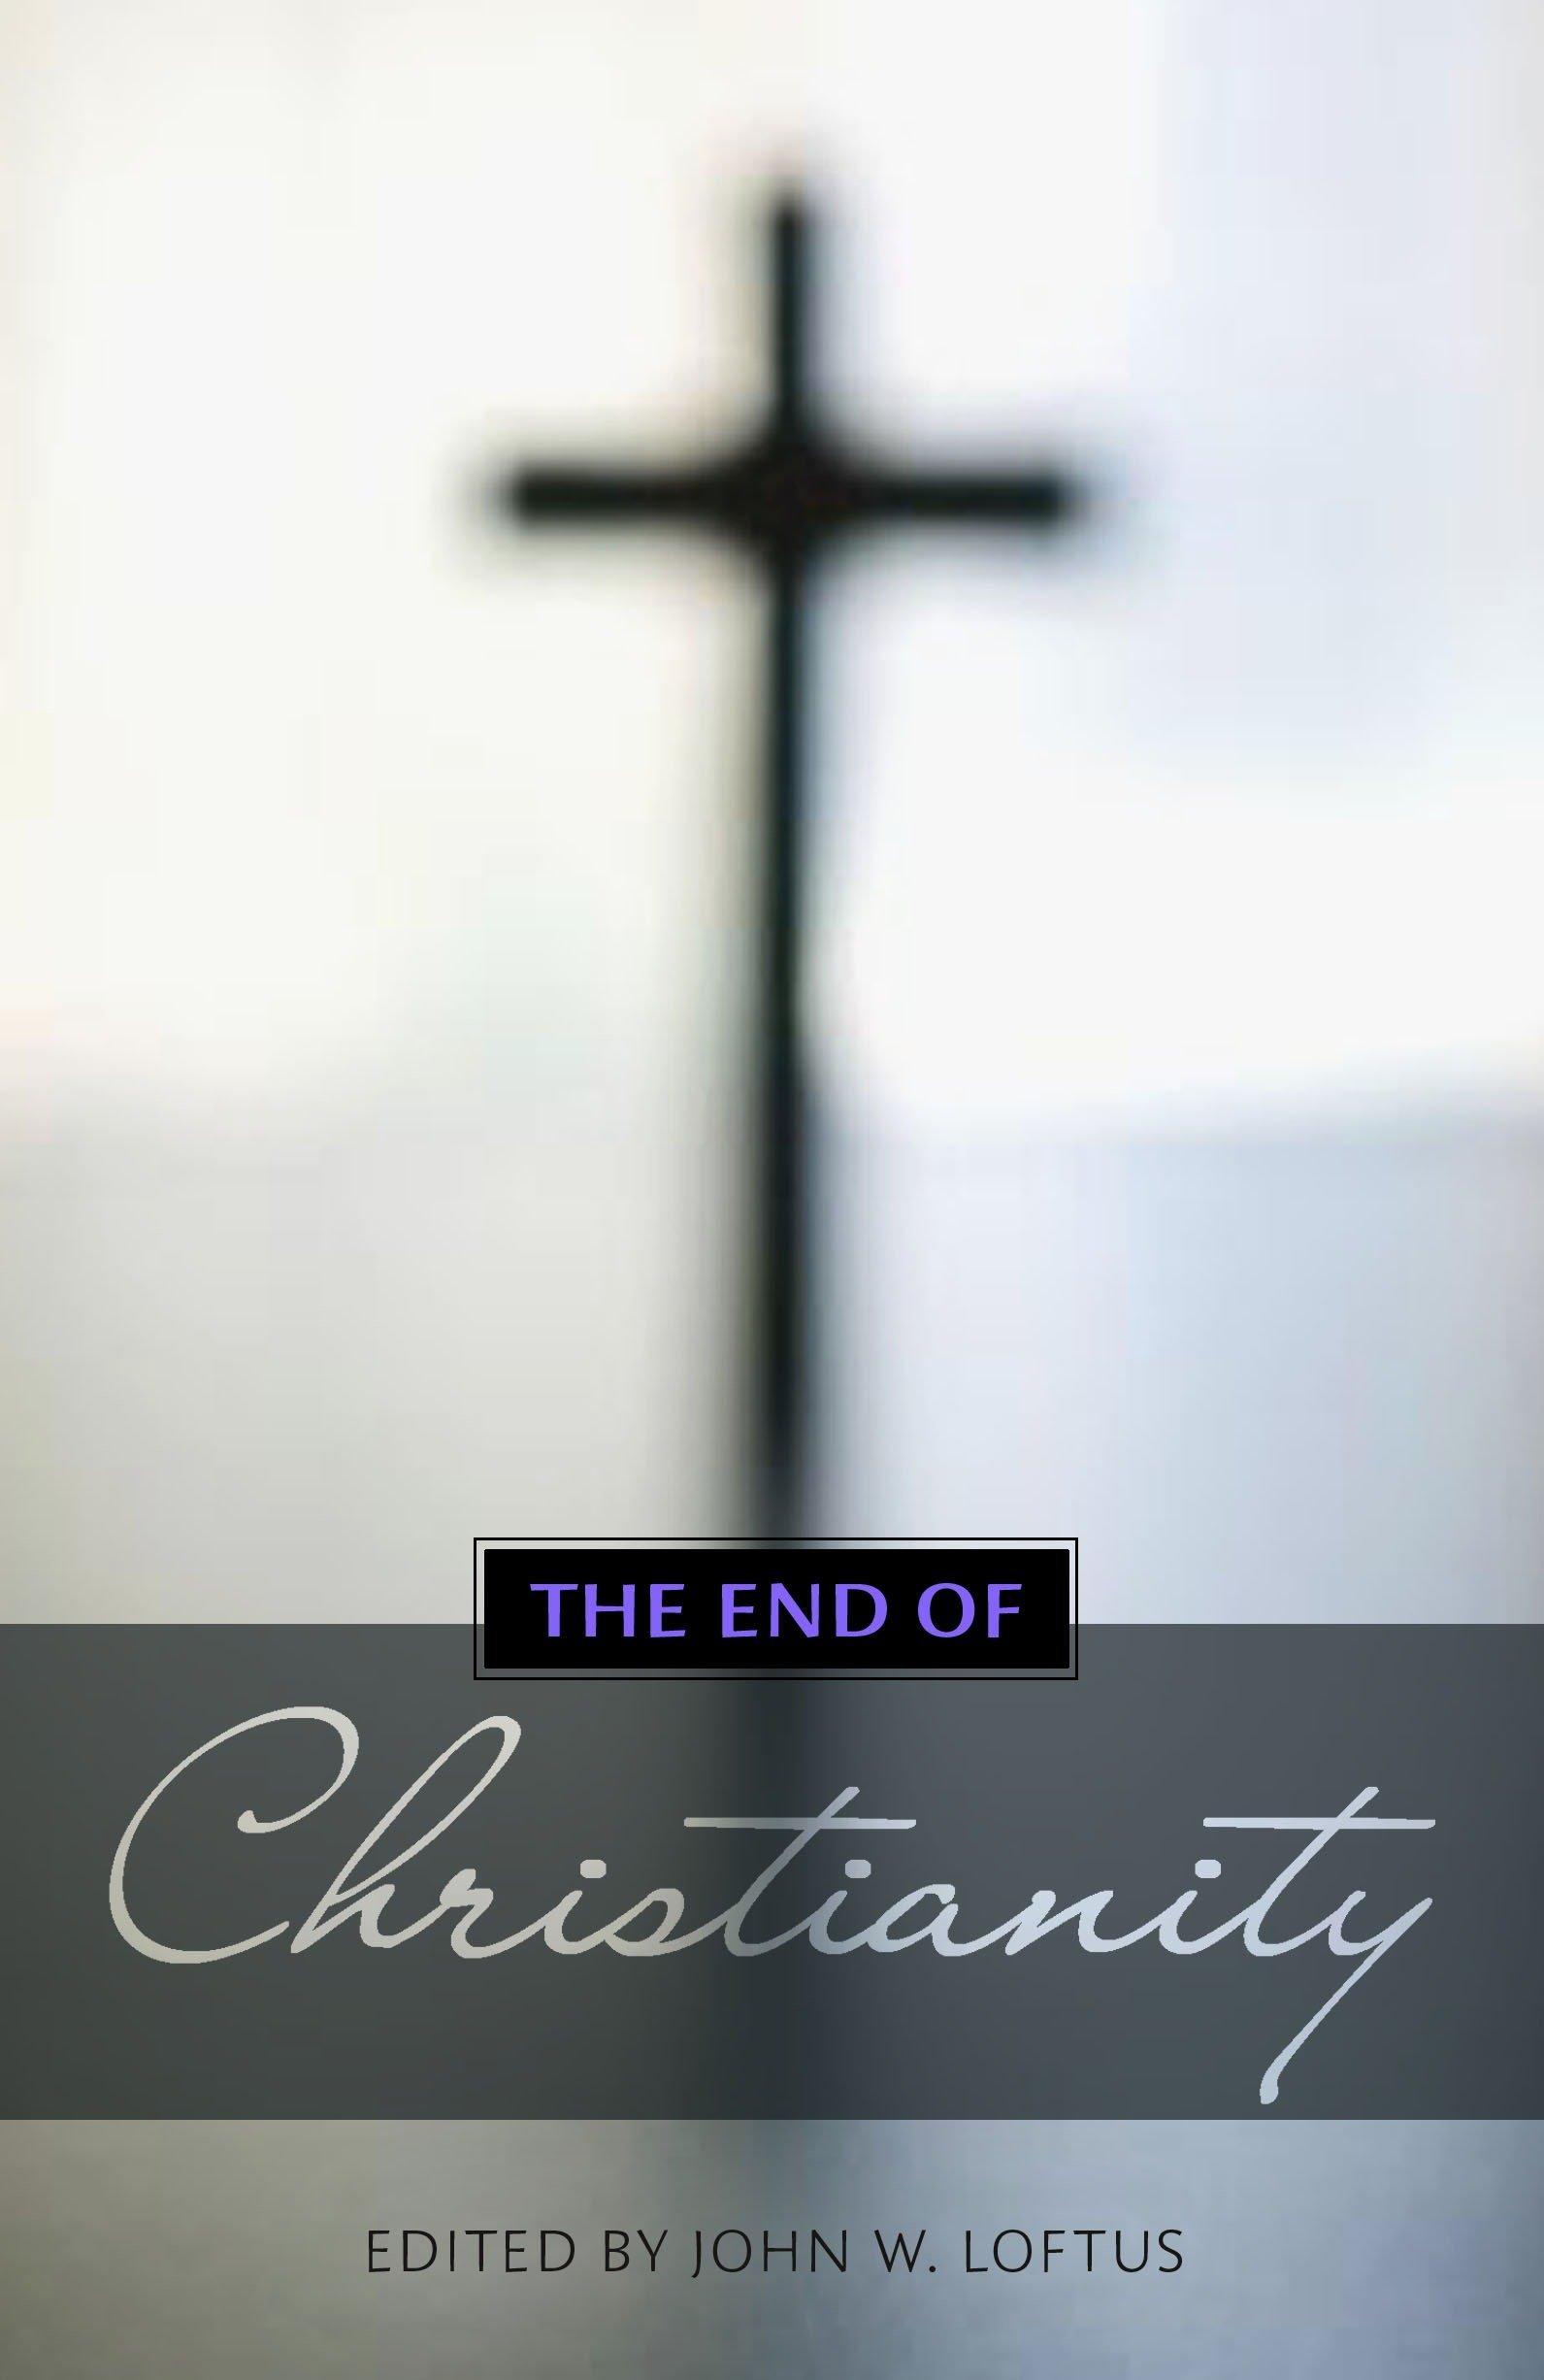 The End Of Christianity John W Loftus 9781616144135 Amazon